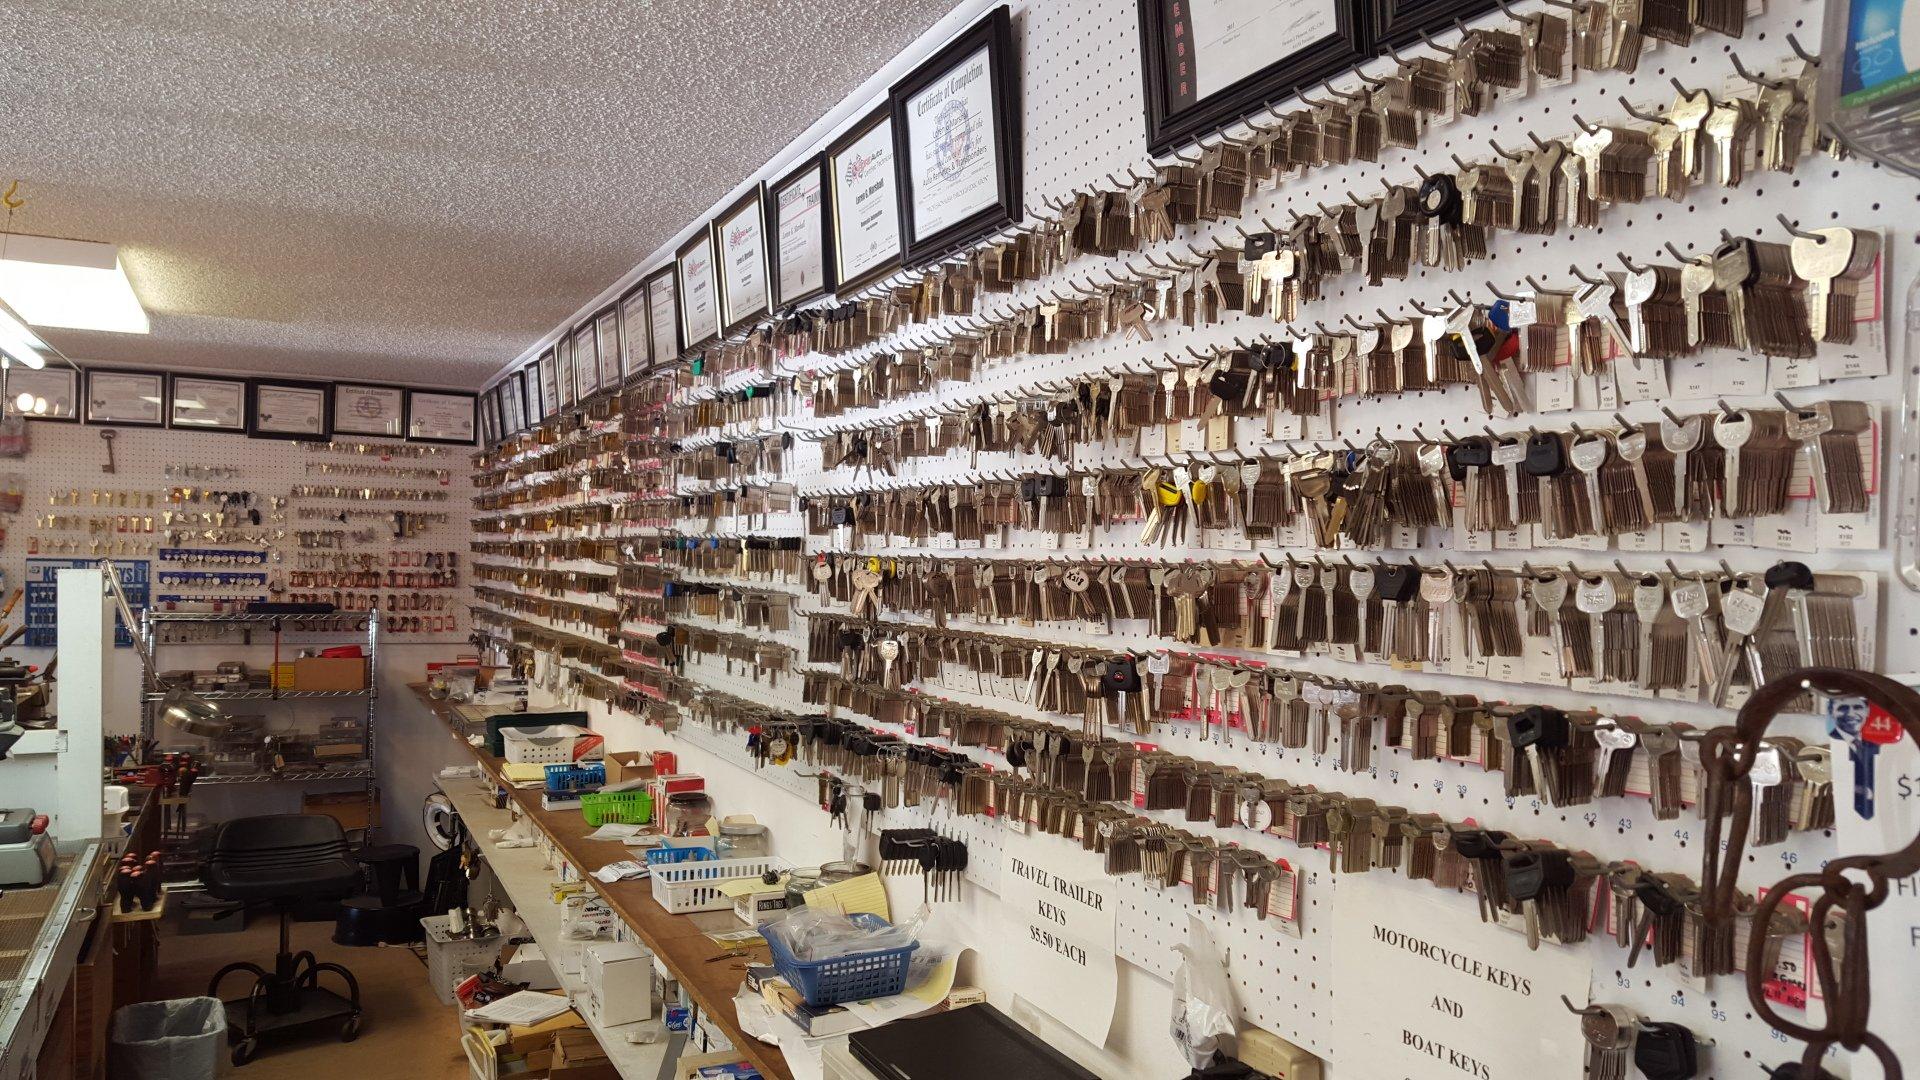 Bill S Lock Amp Key Locksmith Shop Residential And Commercial Locksmith